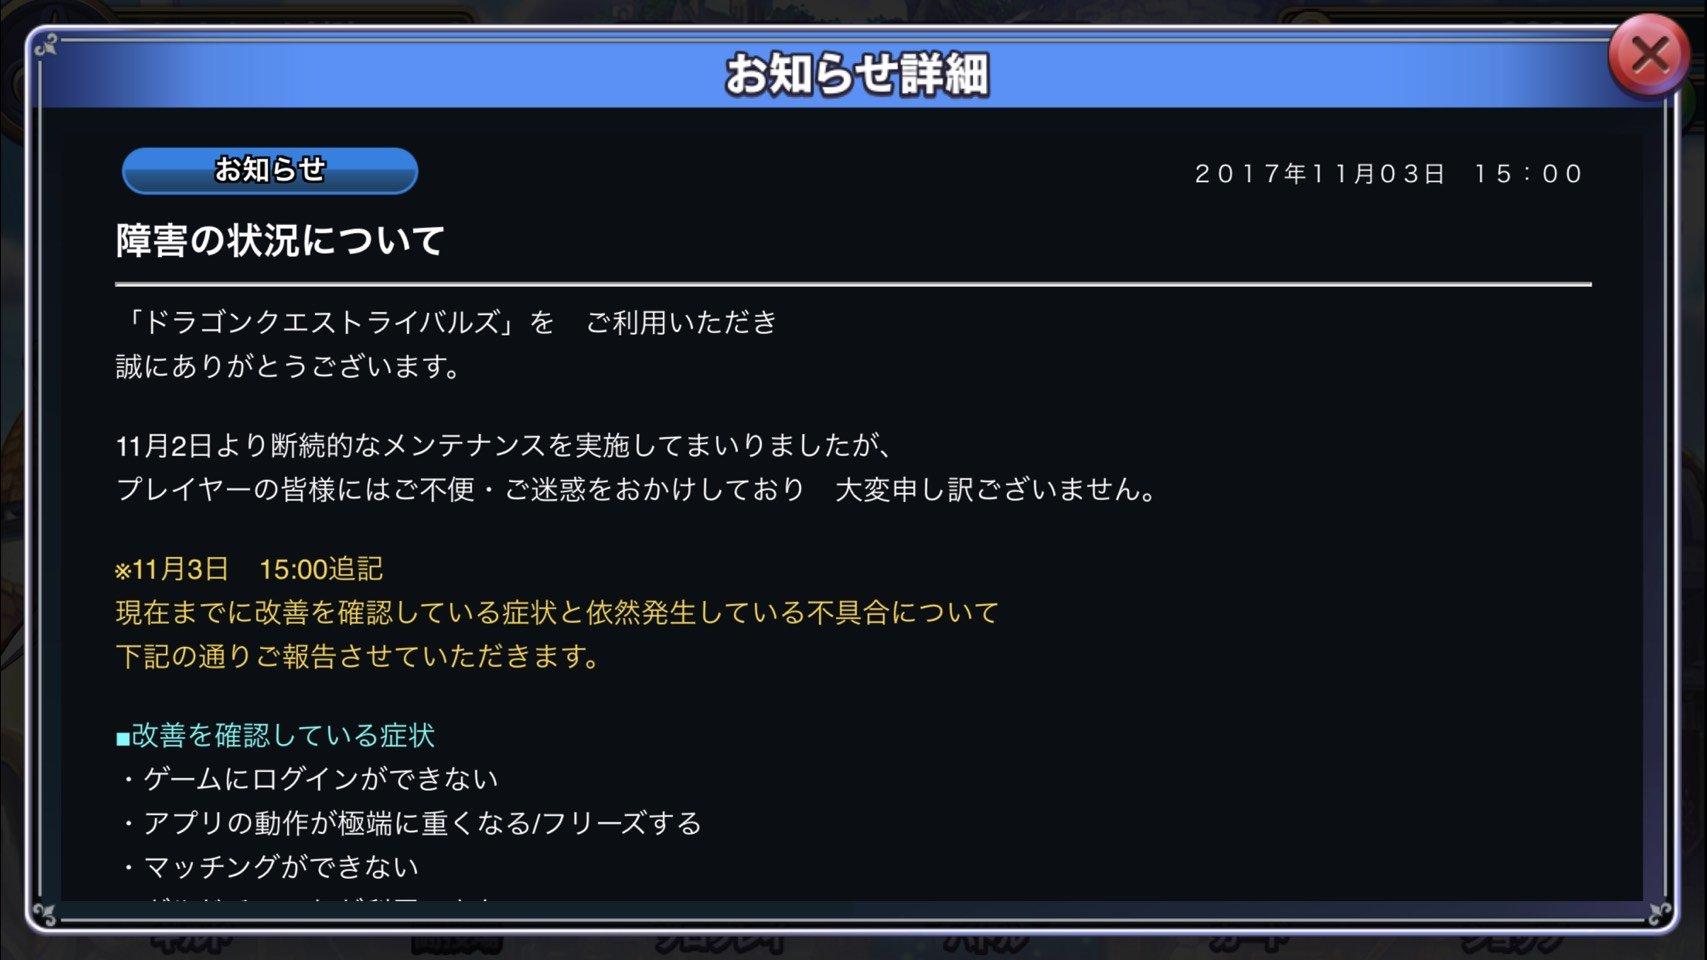 S__9445433.jpg